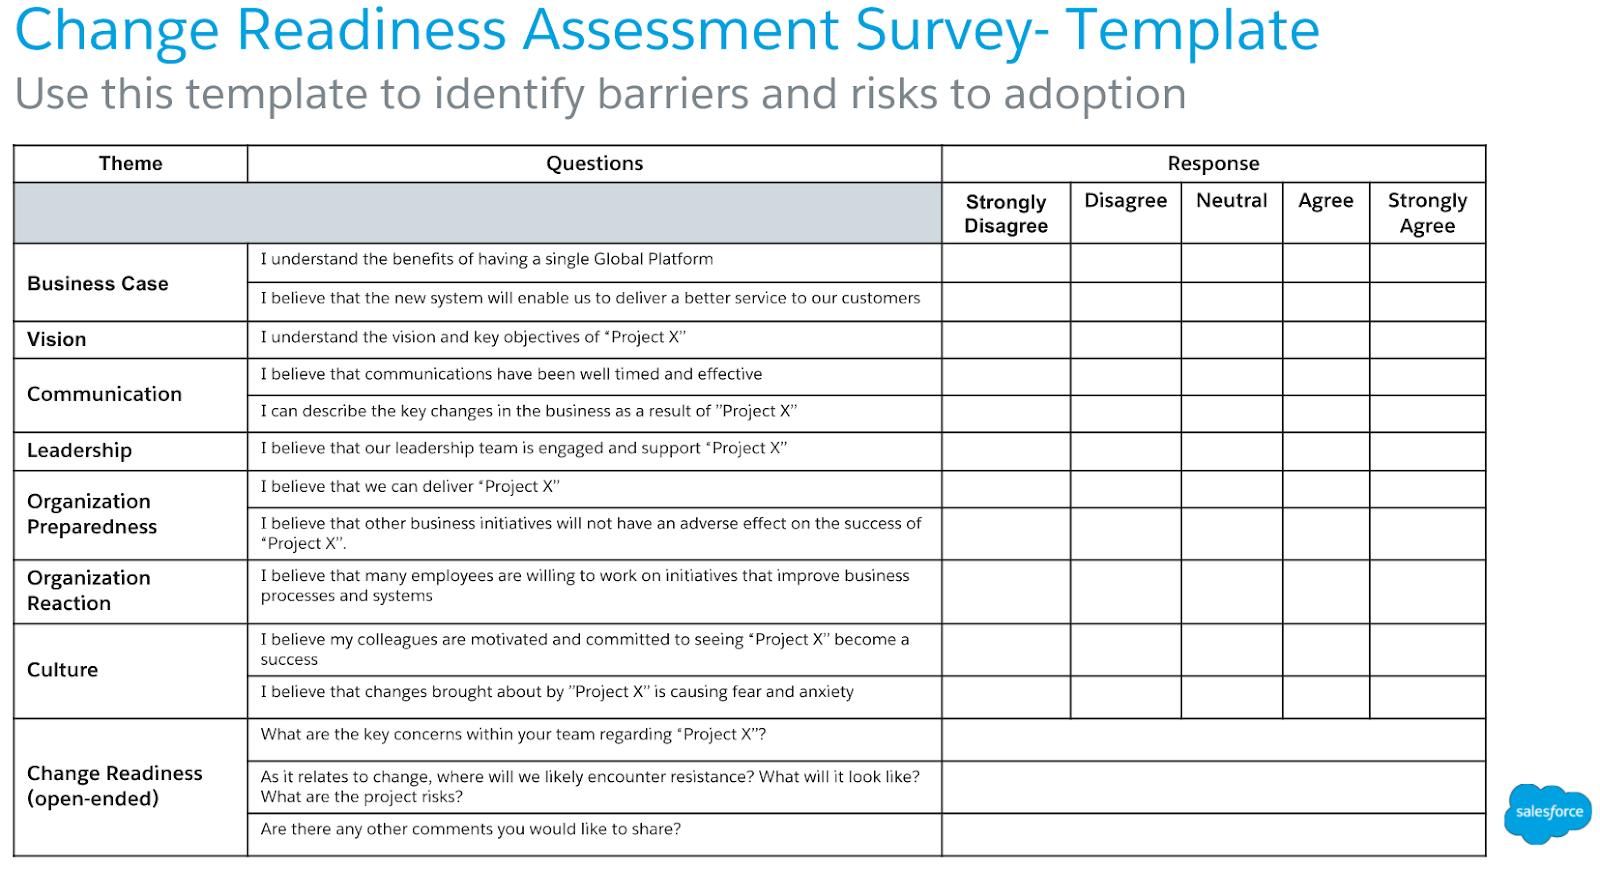 change-readiness-assessment